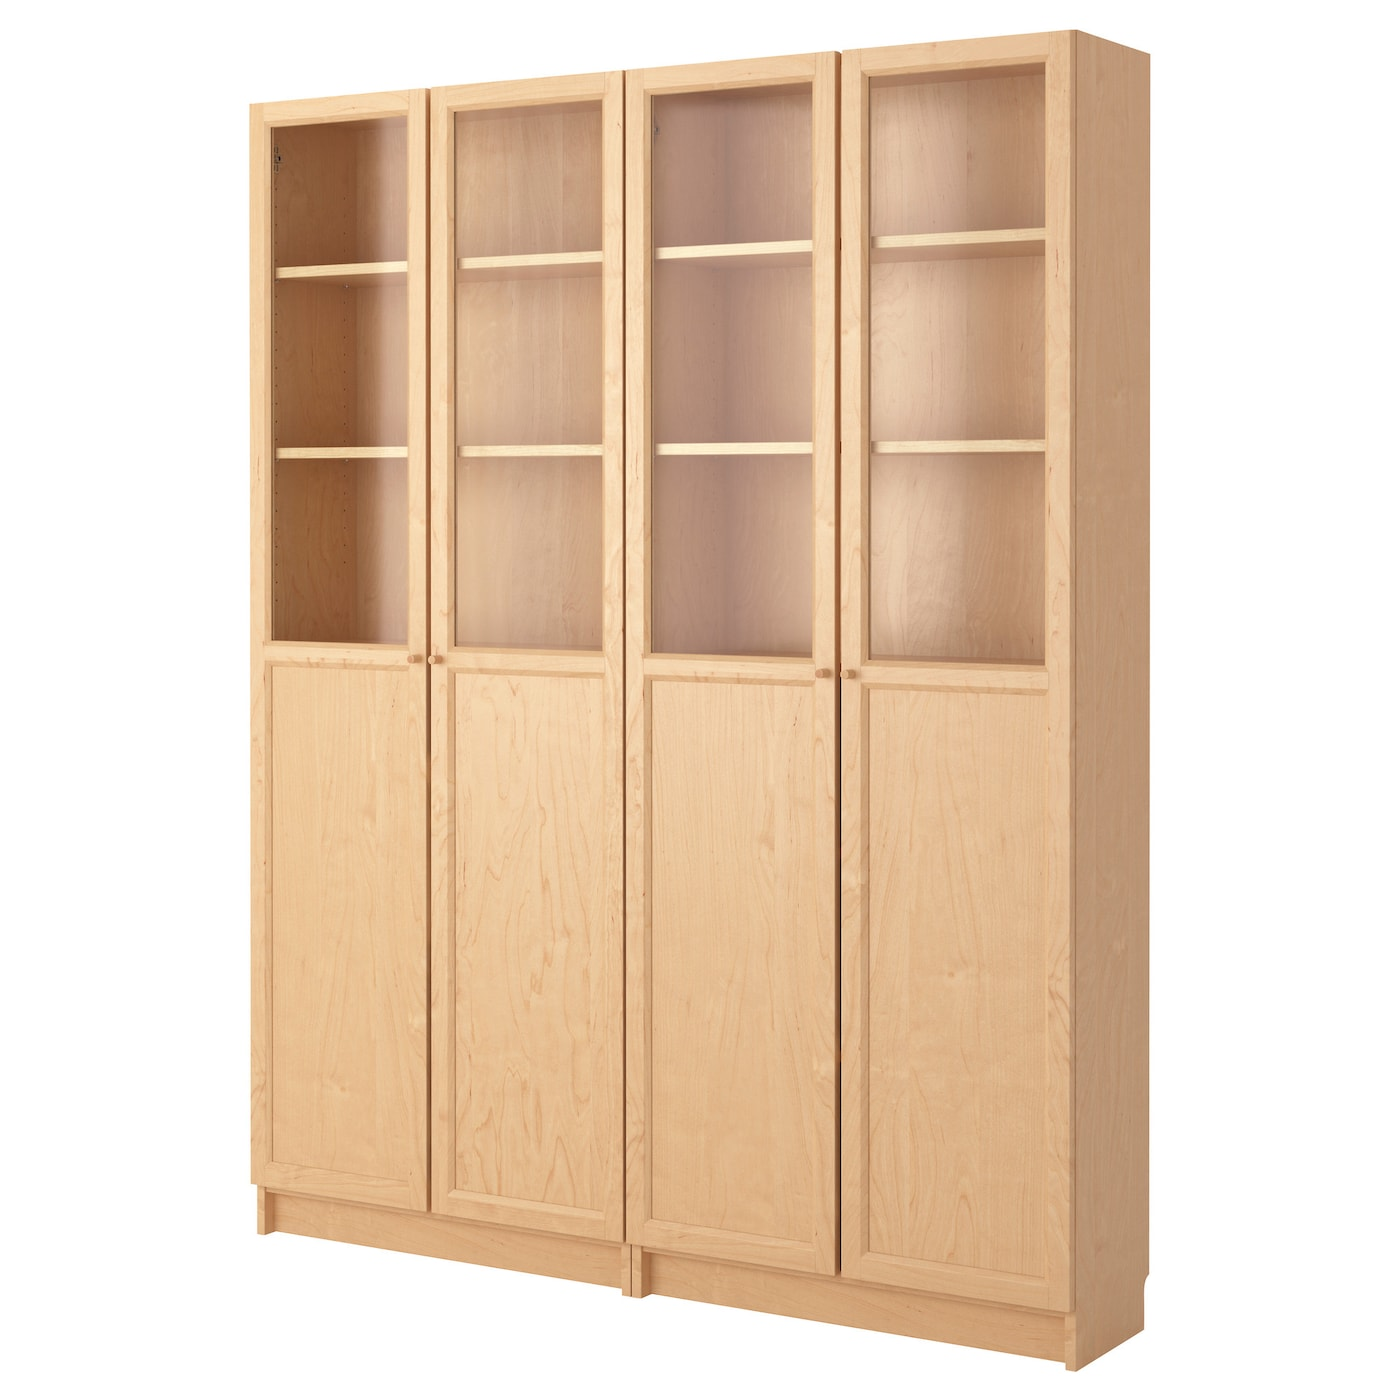 Balkonhängetisch ikea  Ikea Hifi Kommode: Hollywoodschaukel ikea acontin.com. Sideboard ...